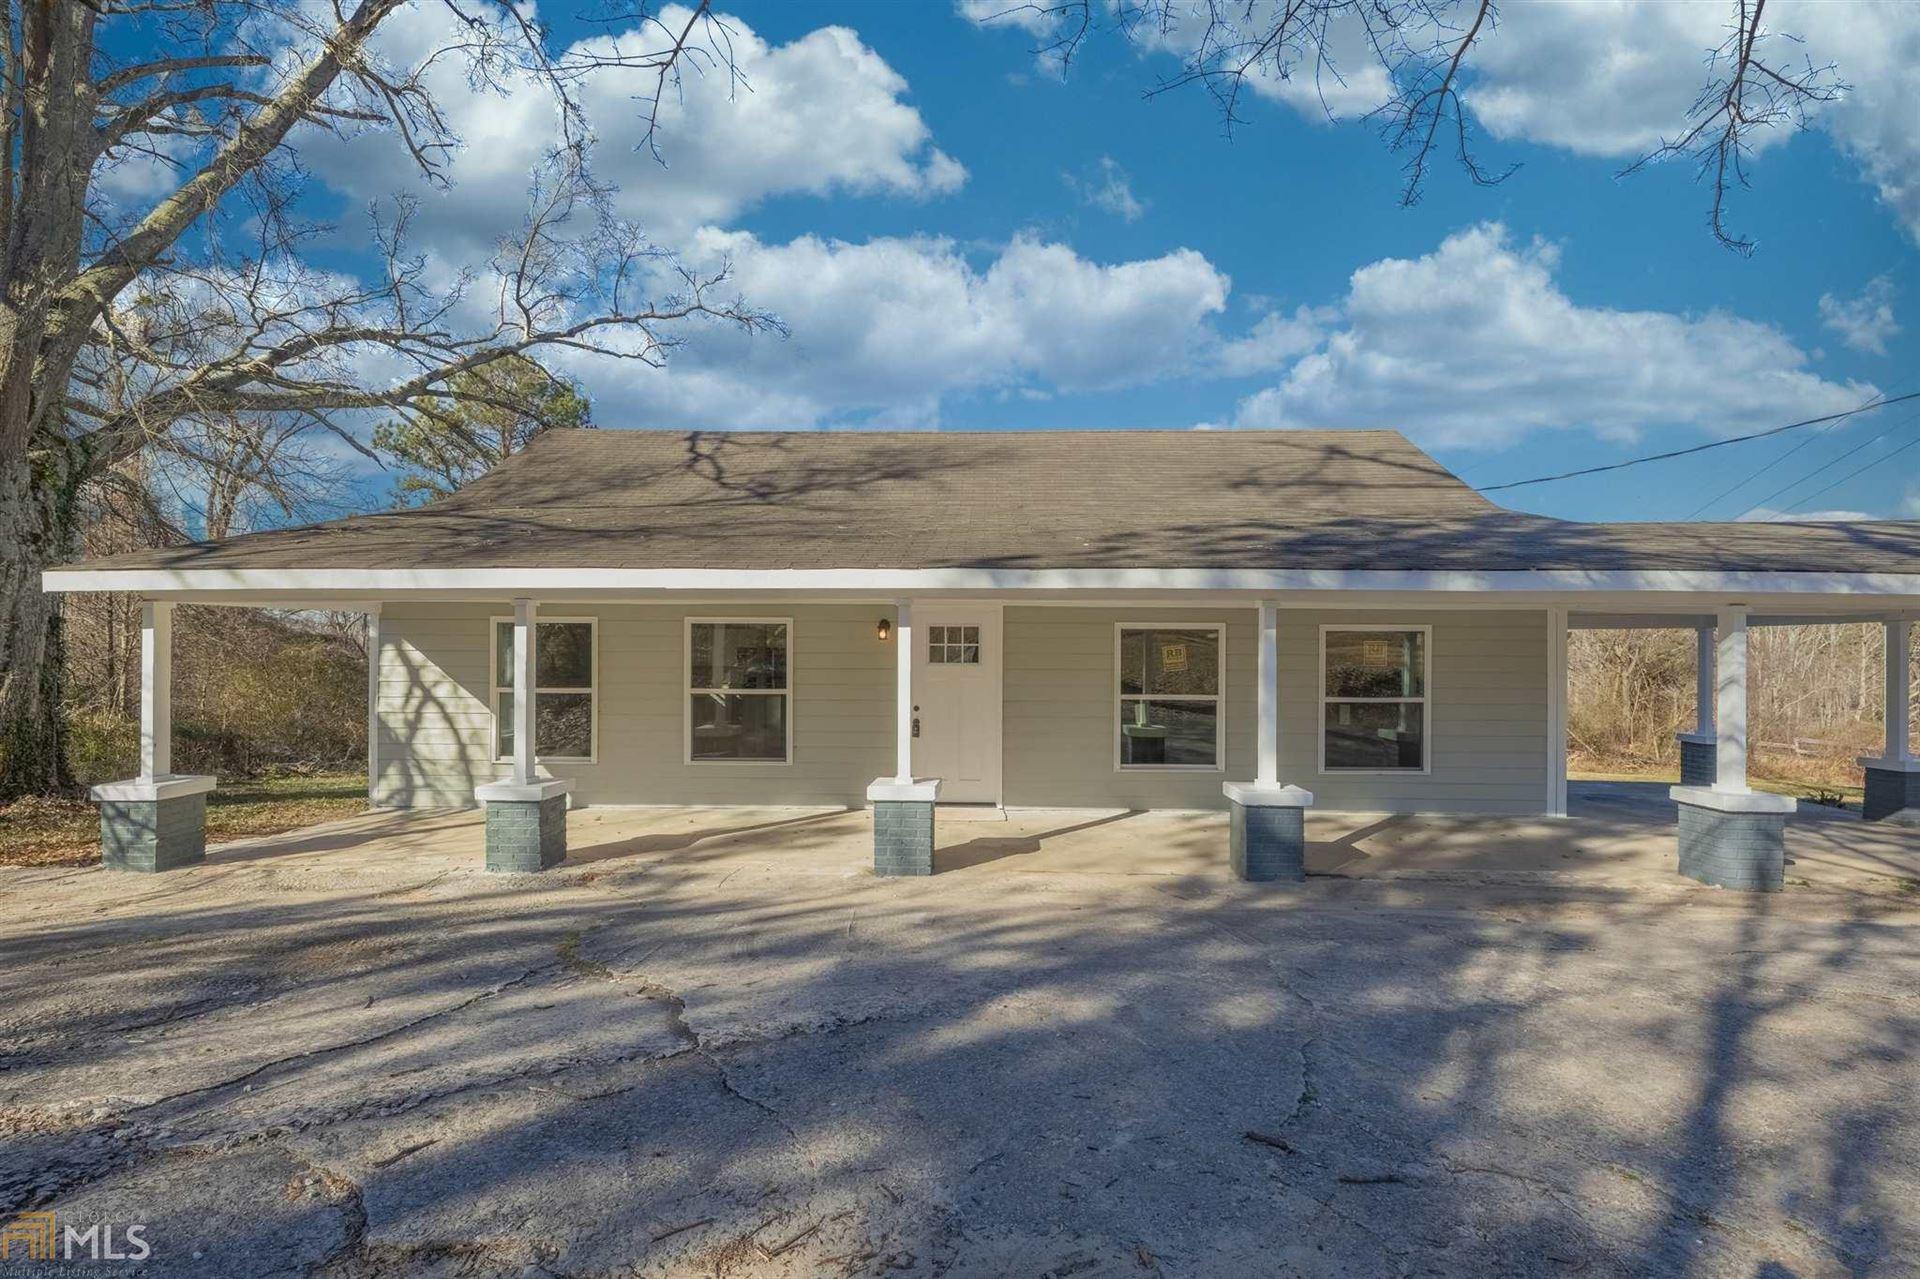 218 Buena Vista Dr, Eastanollee, GA 30538 - MLS#: 8914648